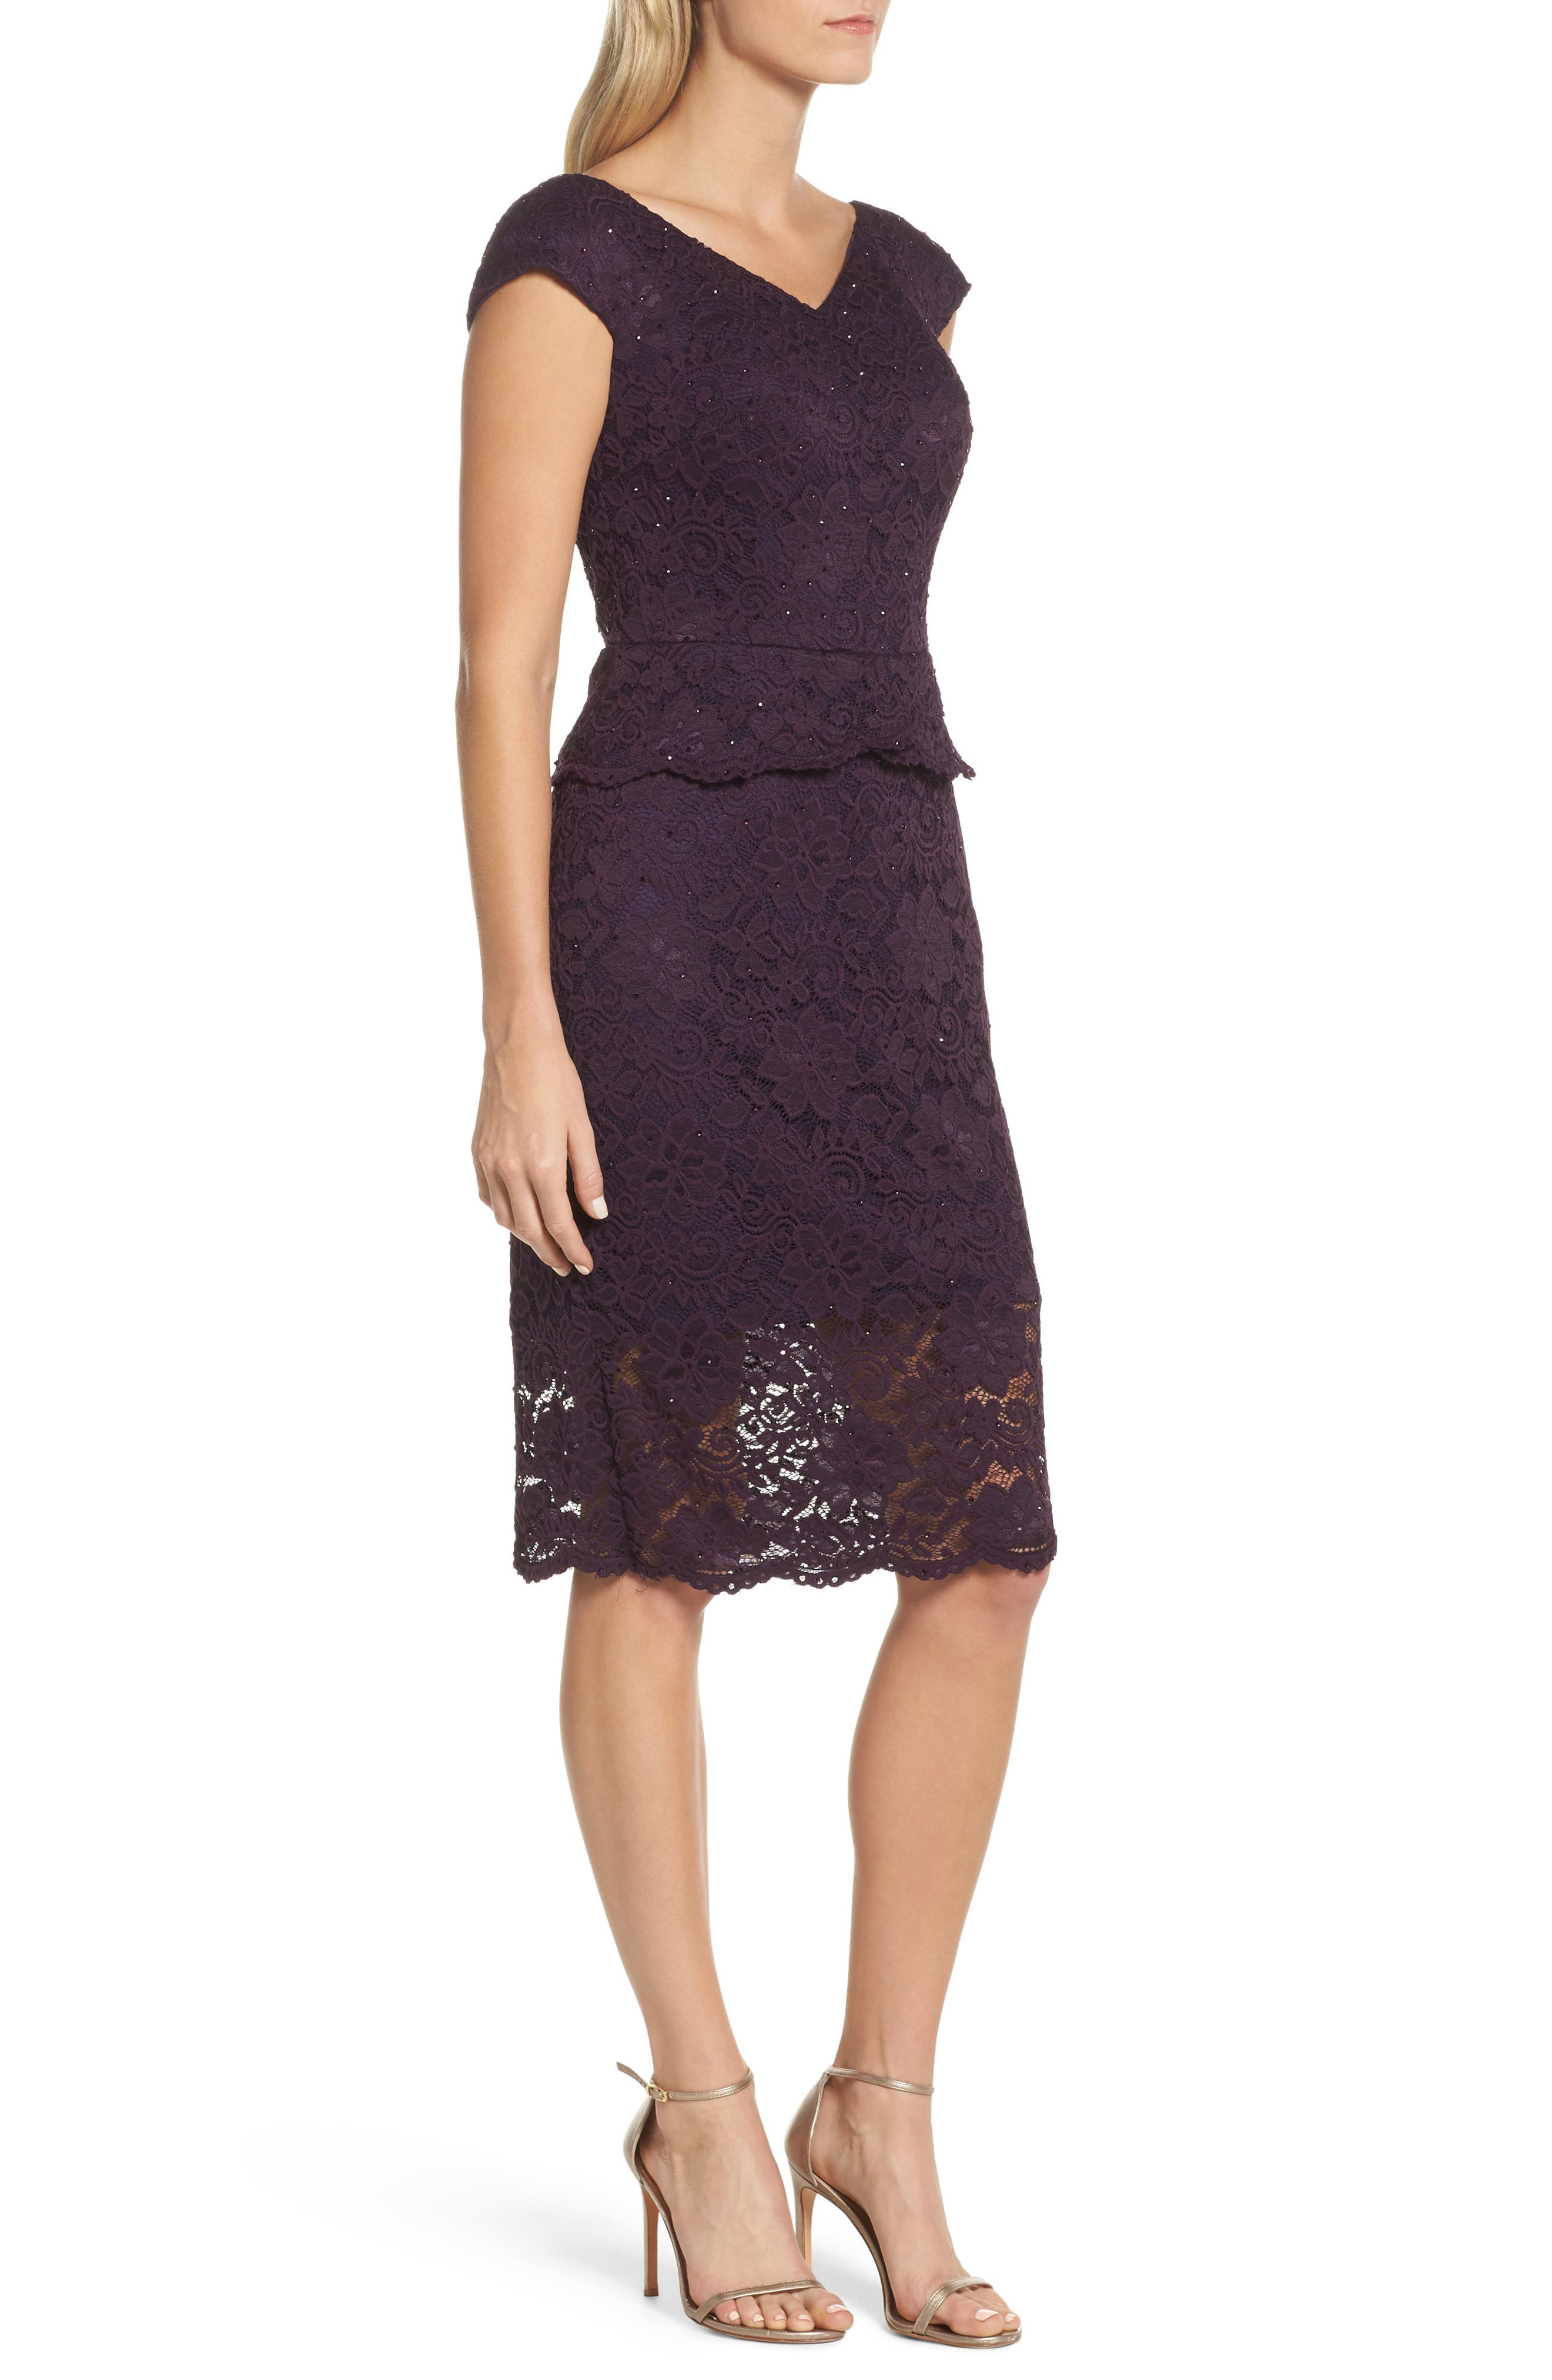 LA FEMME, Embellished Lace Sheath Dress, Alternate thumbnail 3, color, 501